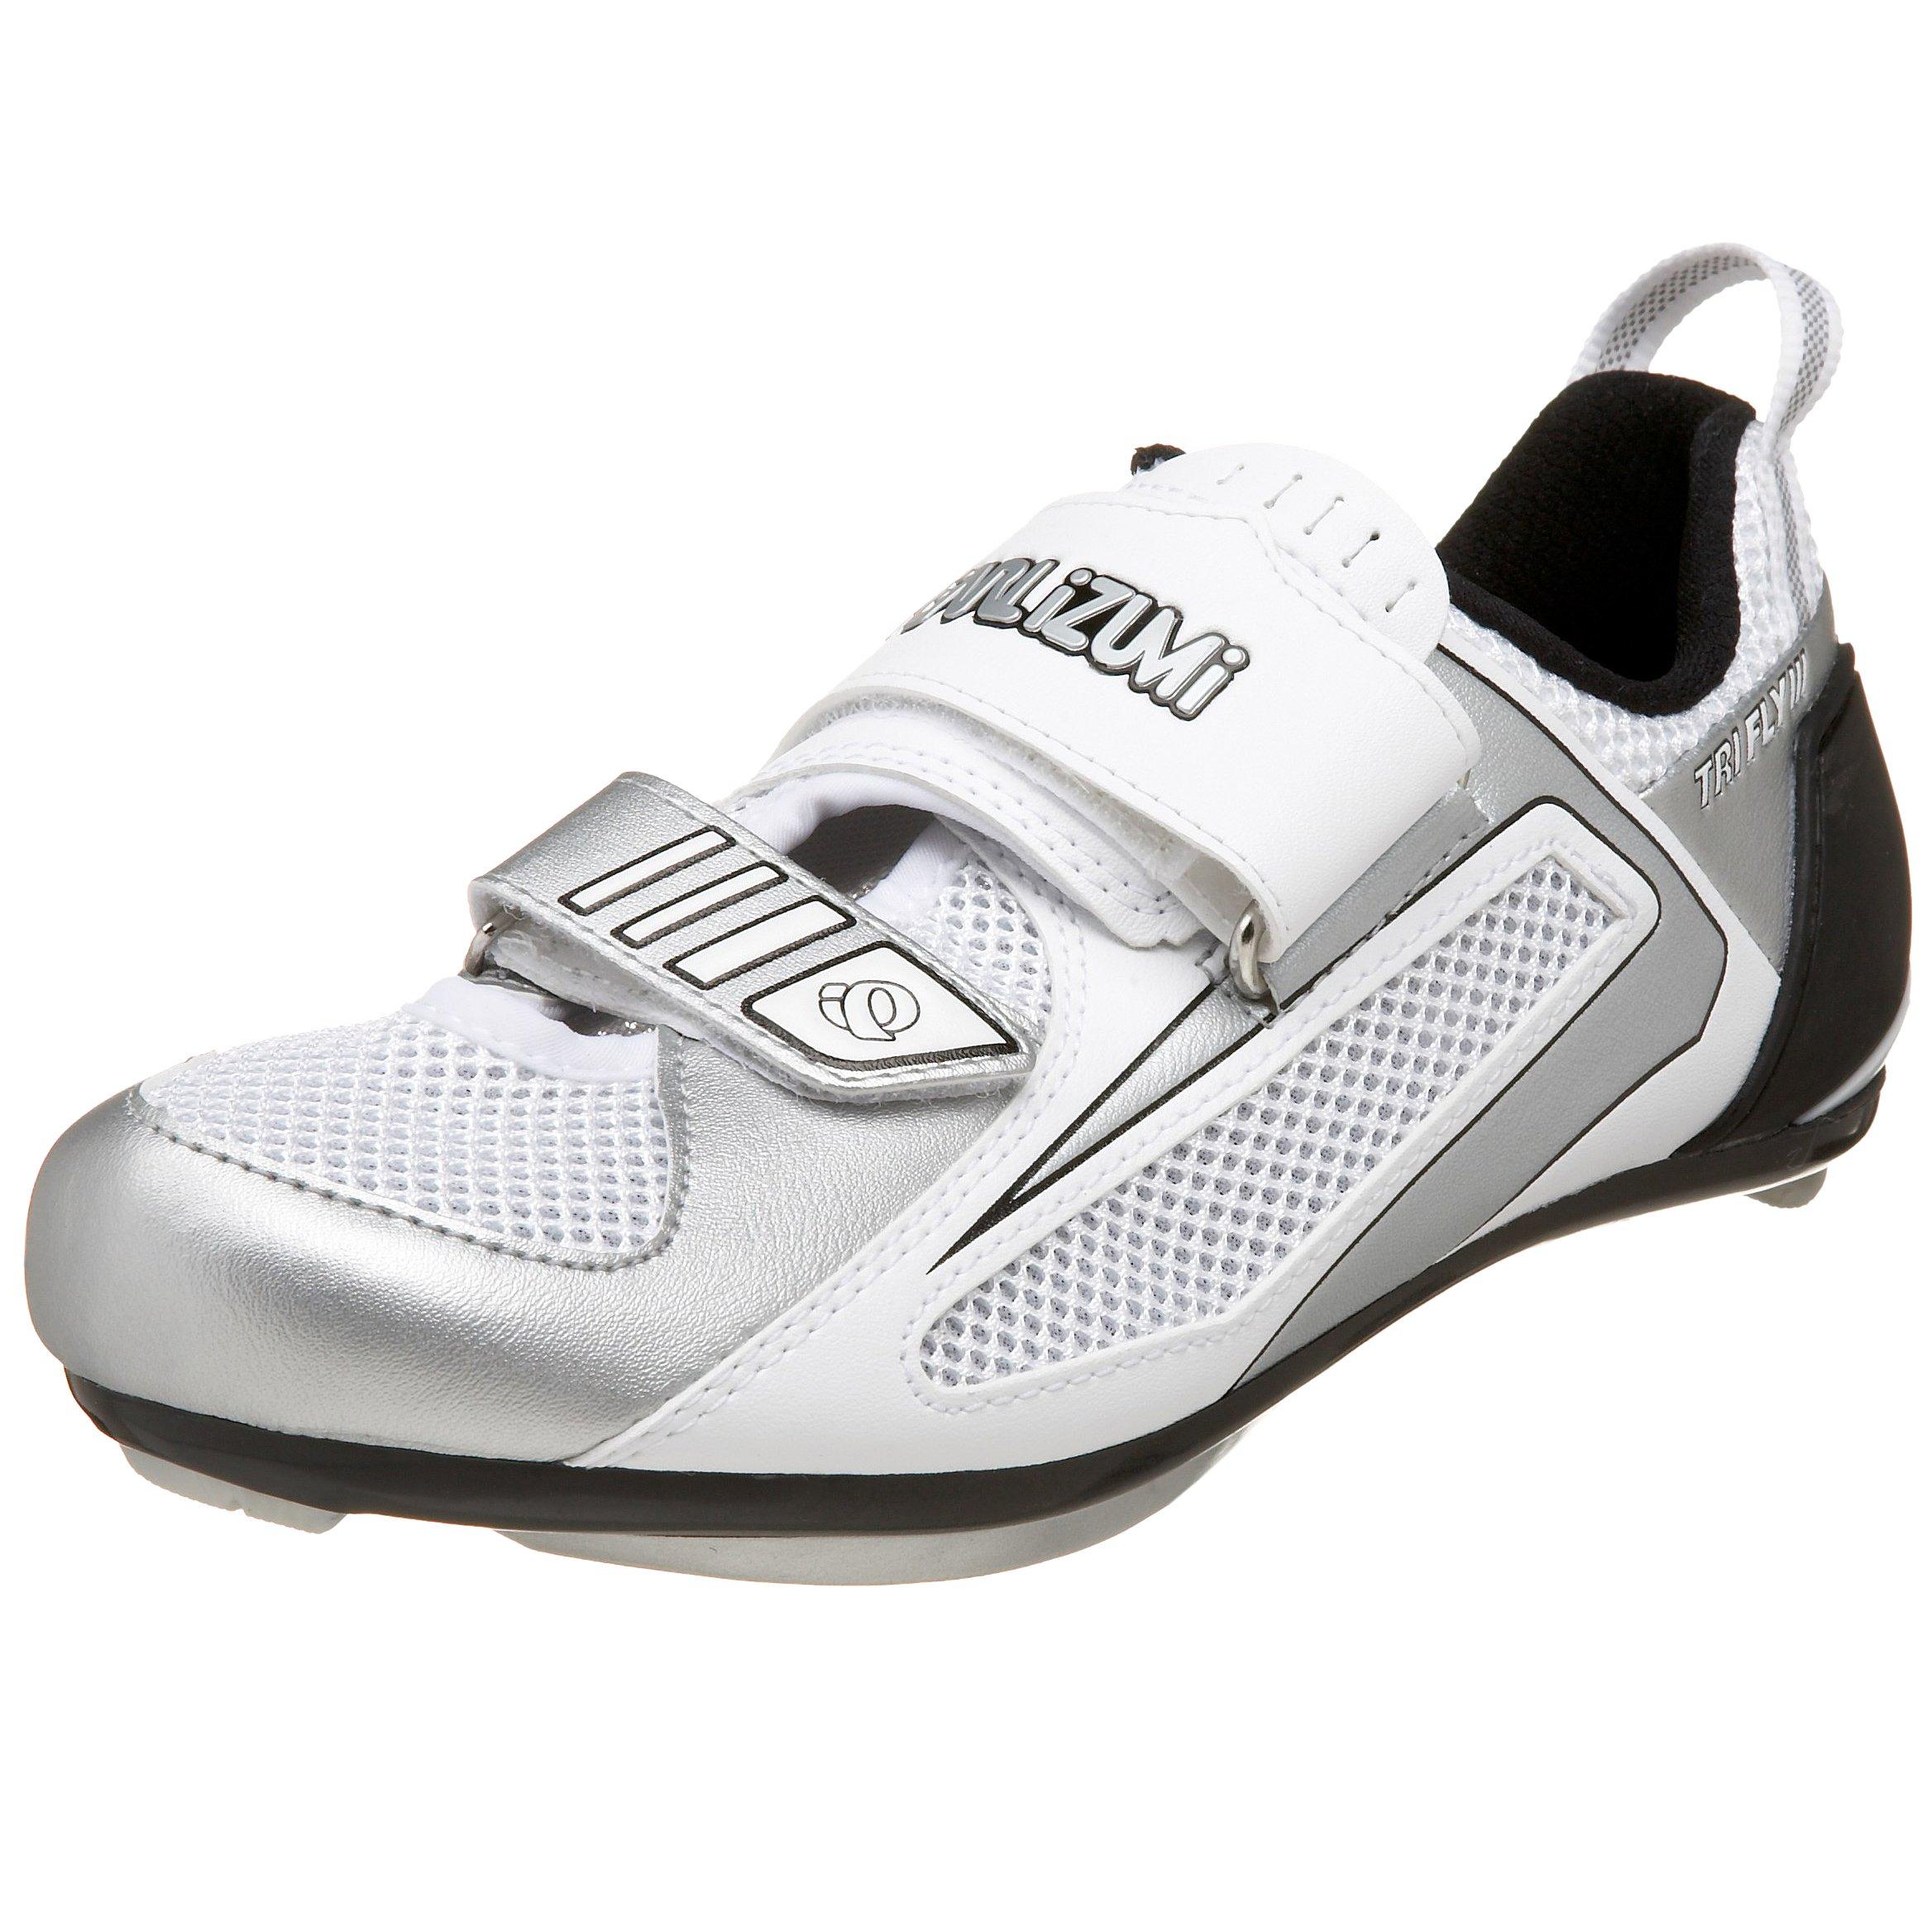 Pearl iZUMi Women's Tri Fly III Triathlon Shoe,White/Silver,37 M EU/US Women's 5.5 M